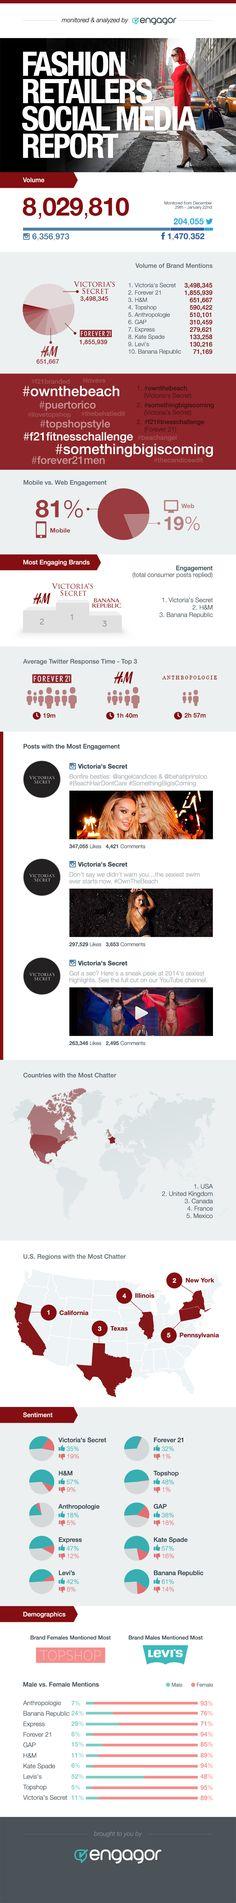 Fashion retailers social media report #infographic #socialmedia